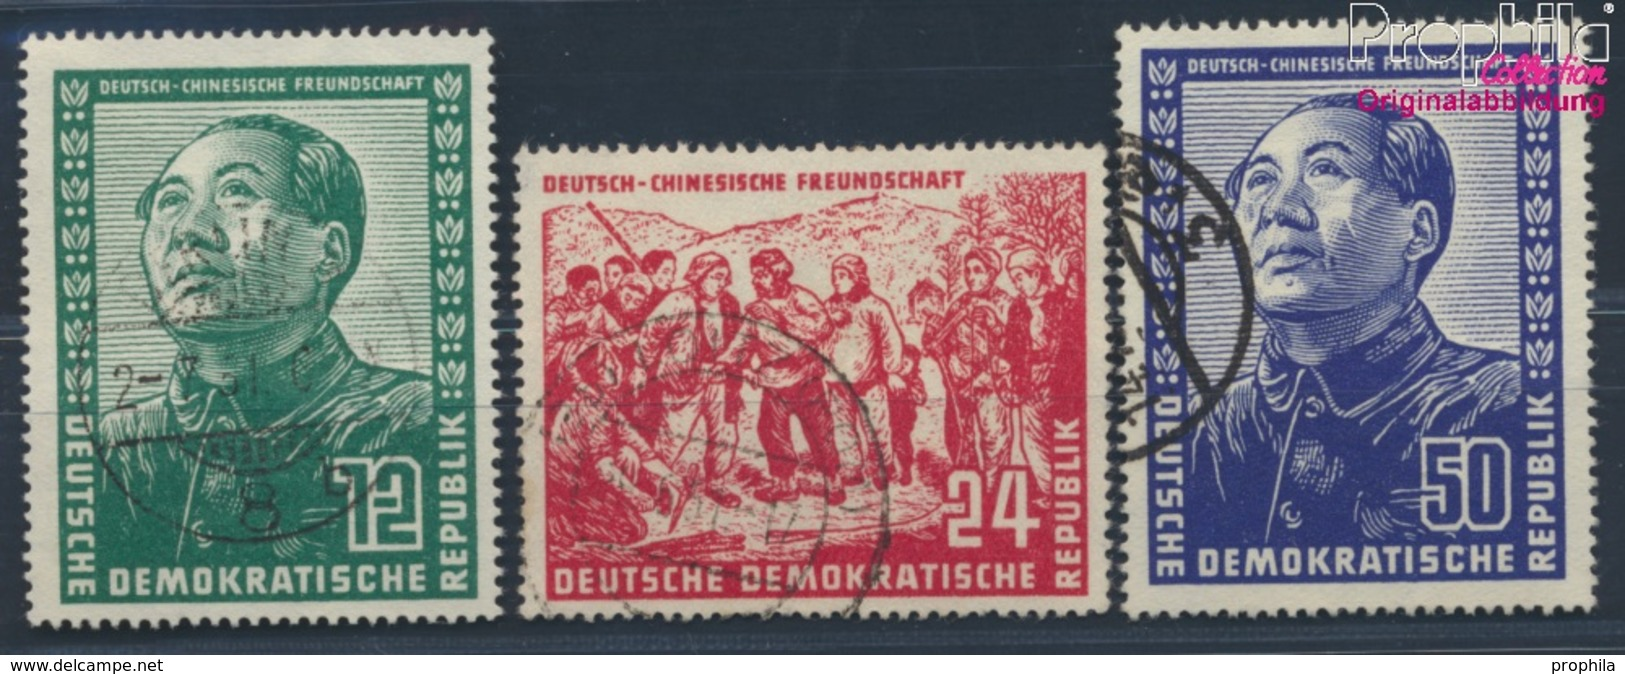 DDR 286-288 (kompl.Ausg.) Gestempelt 1951 Deutsch-chinesische Freundschaft (8830798 - DDR